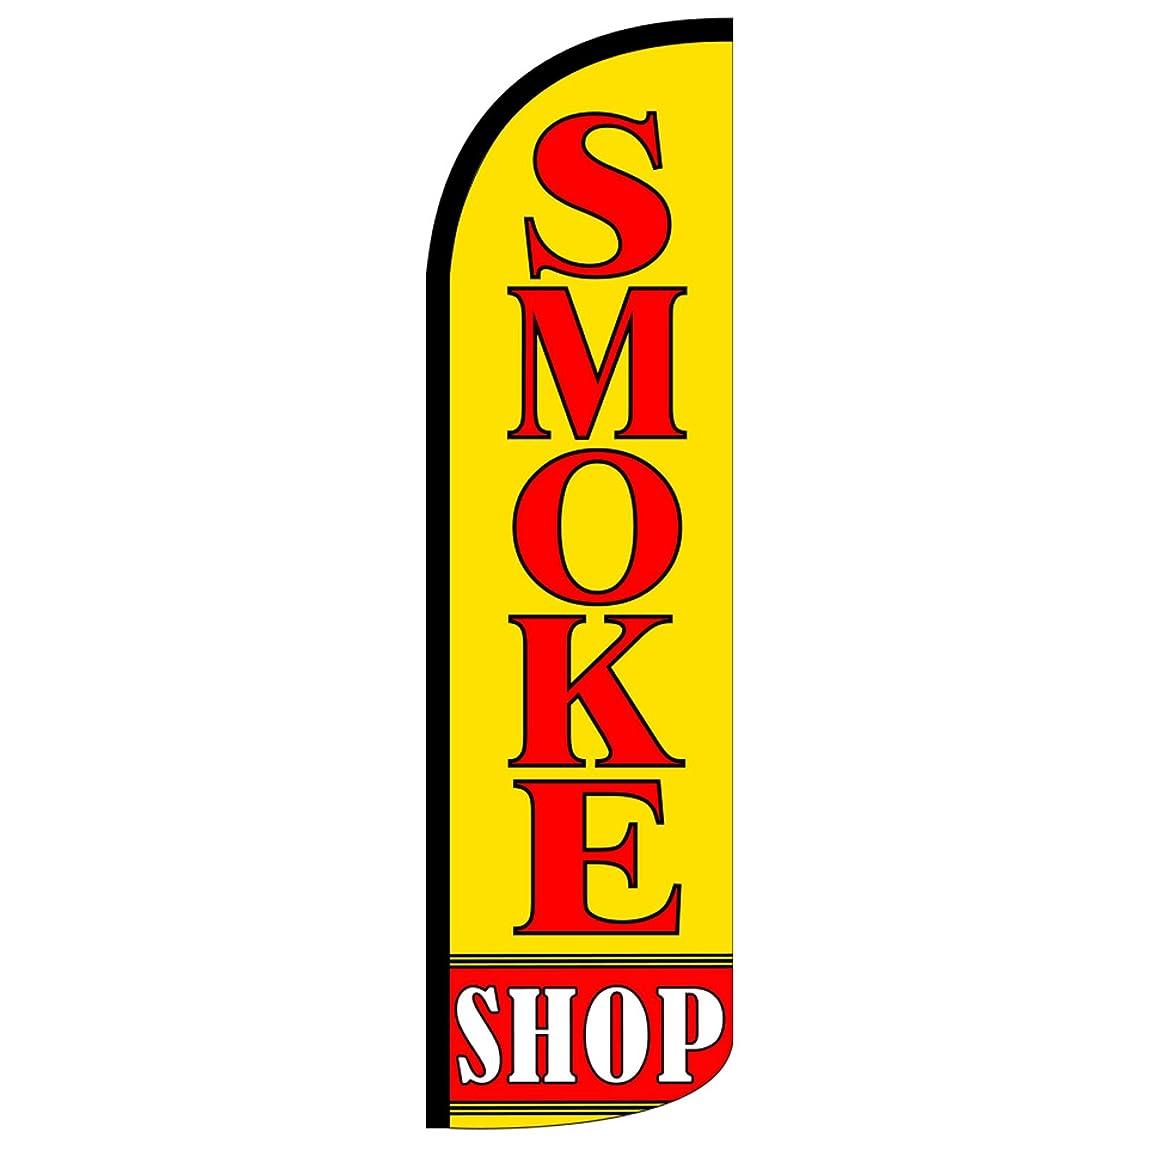 Smoke Shop Windless Feather Swooper Flag Banner Kit: 14' Pole Set, Safety Orange Stake